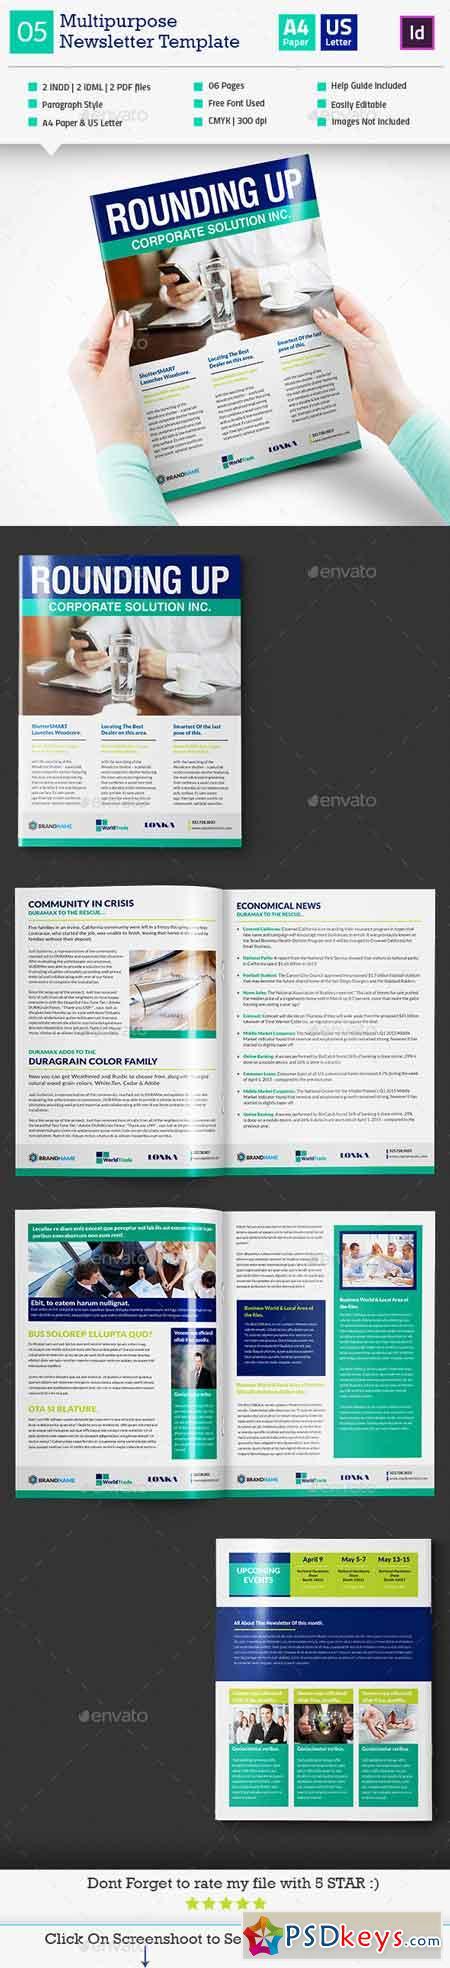 Multipurpose Newsletter Template_InDesign_V5 11881033